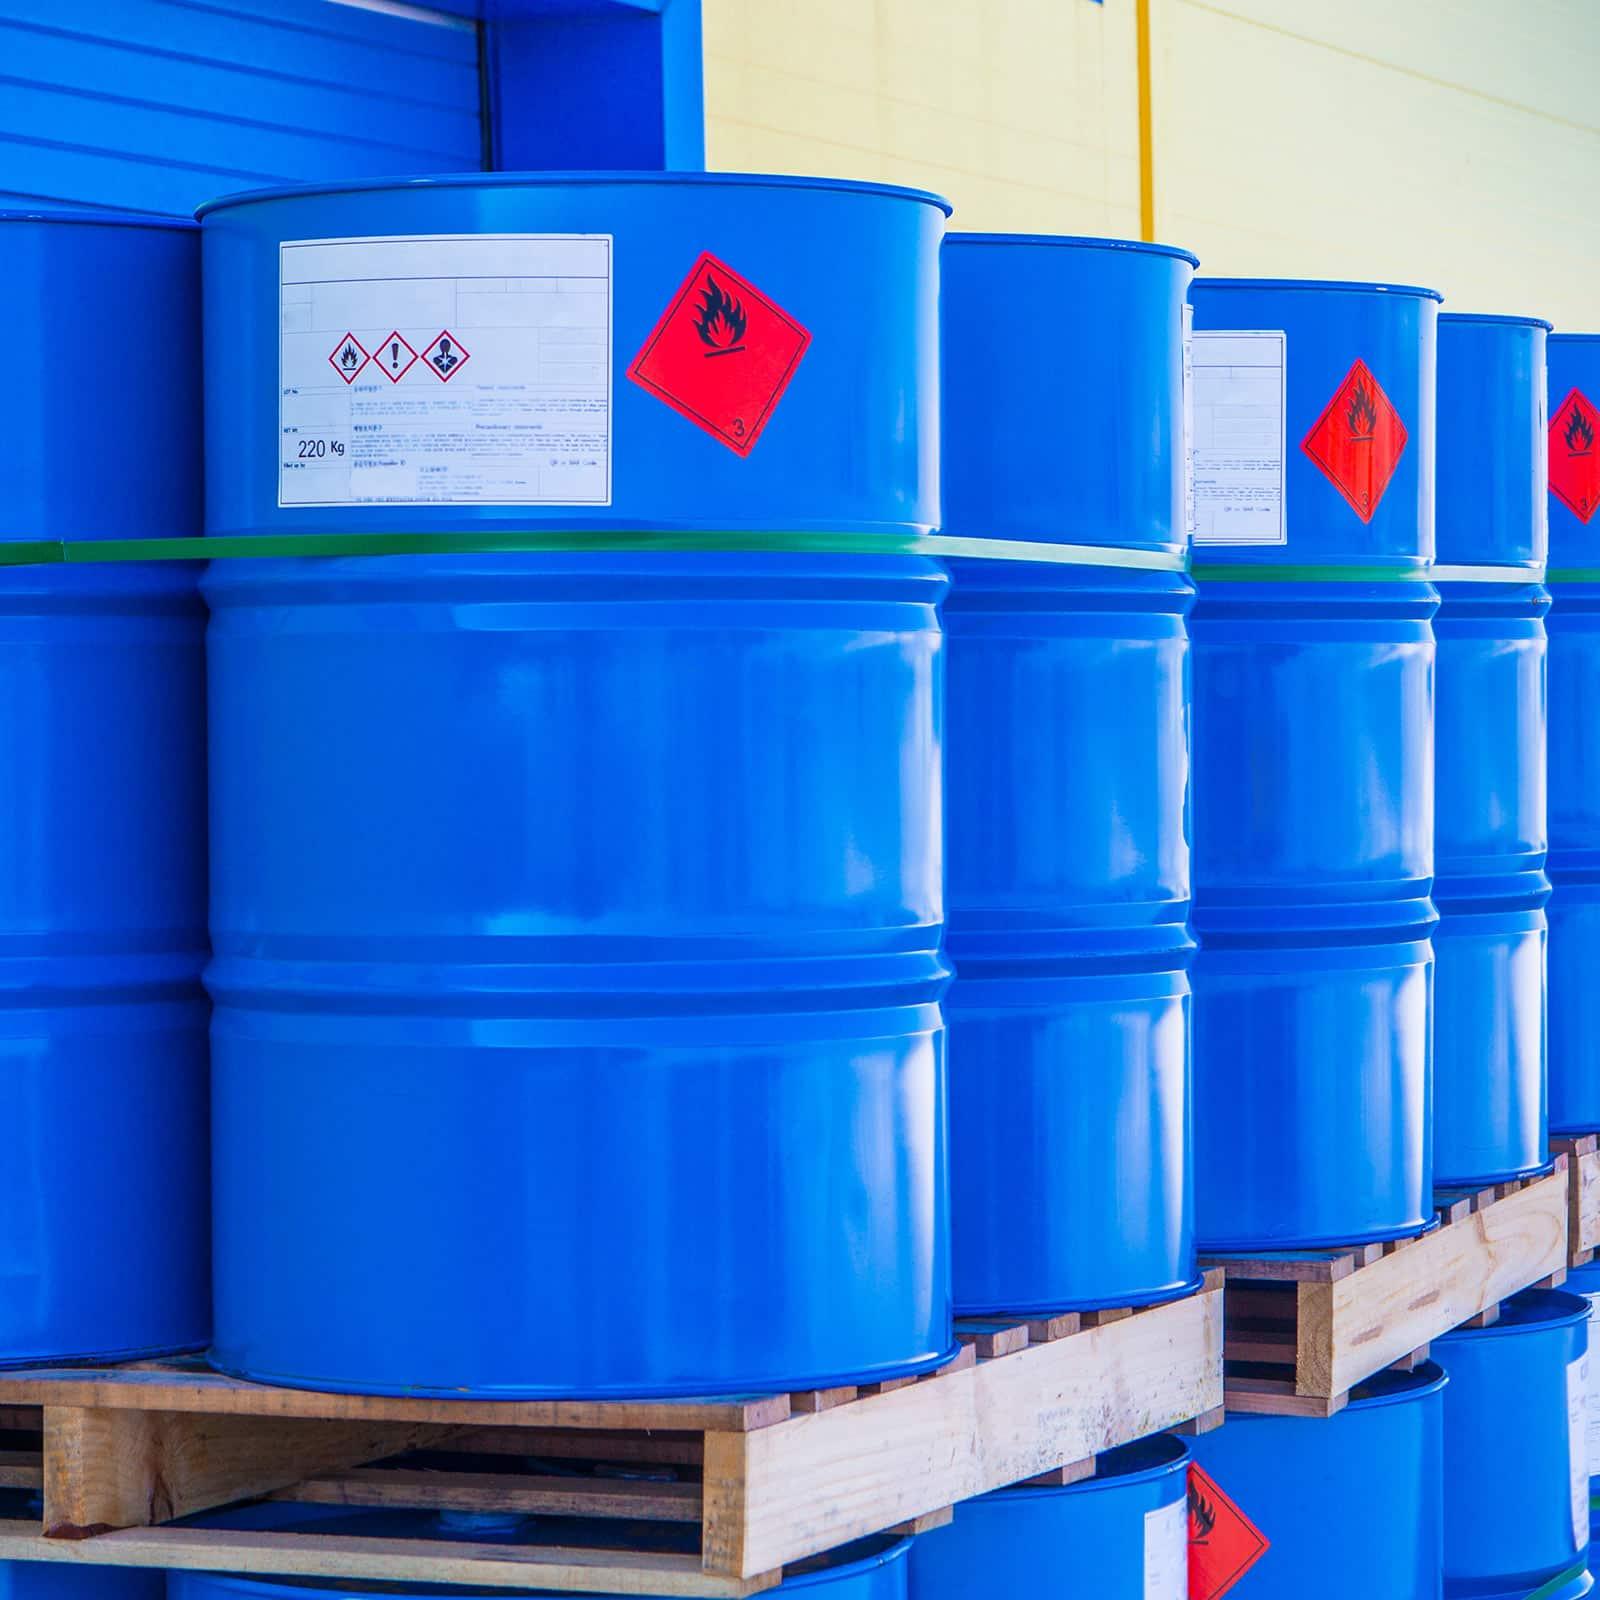 Barrels with SDS labels